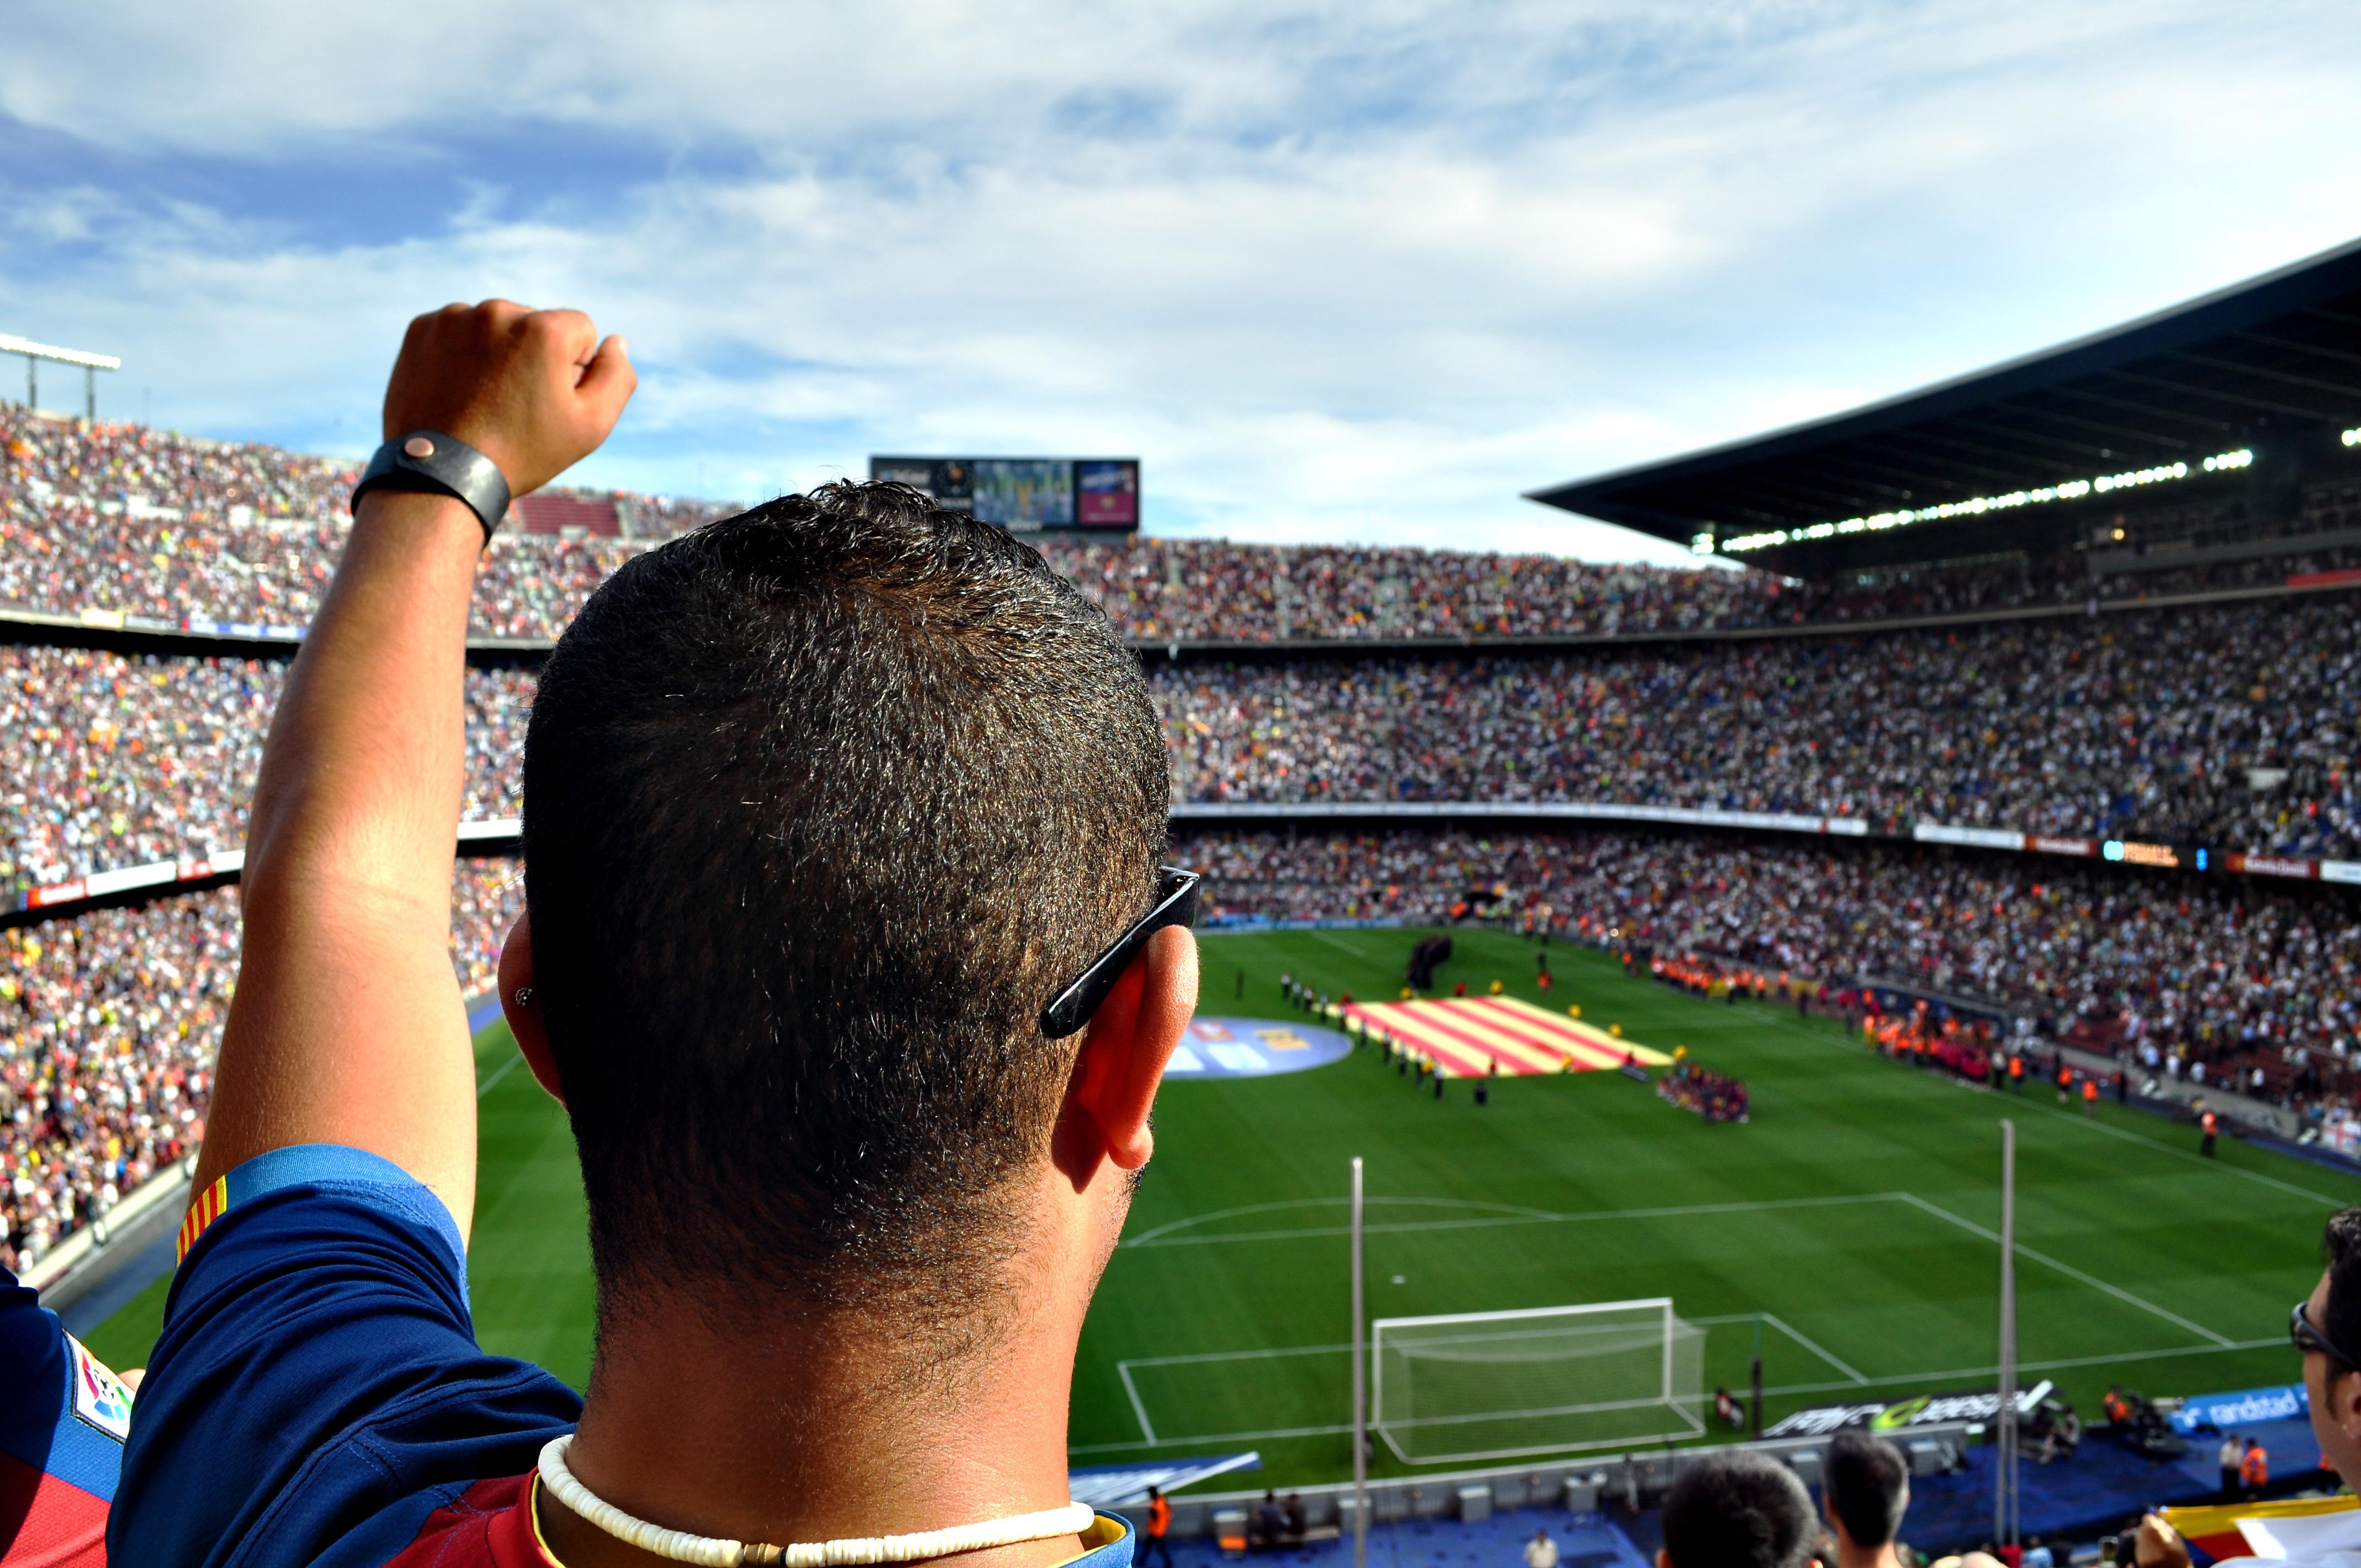 Football fan, Reasons to visit Spain